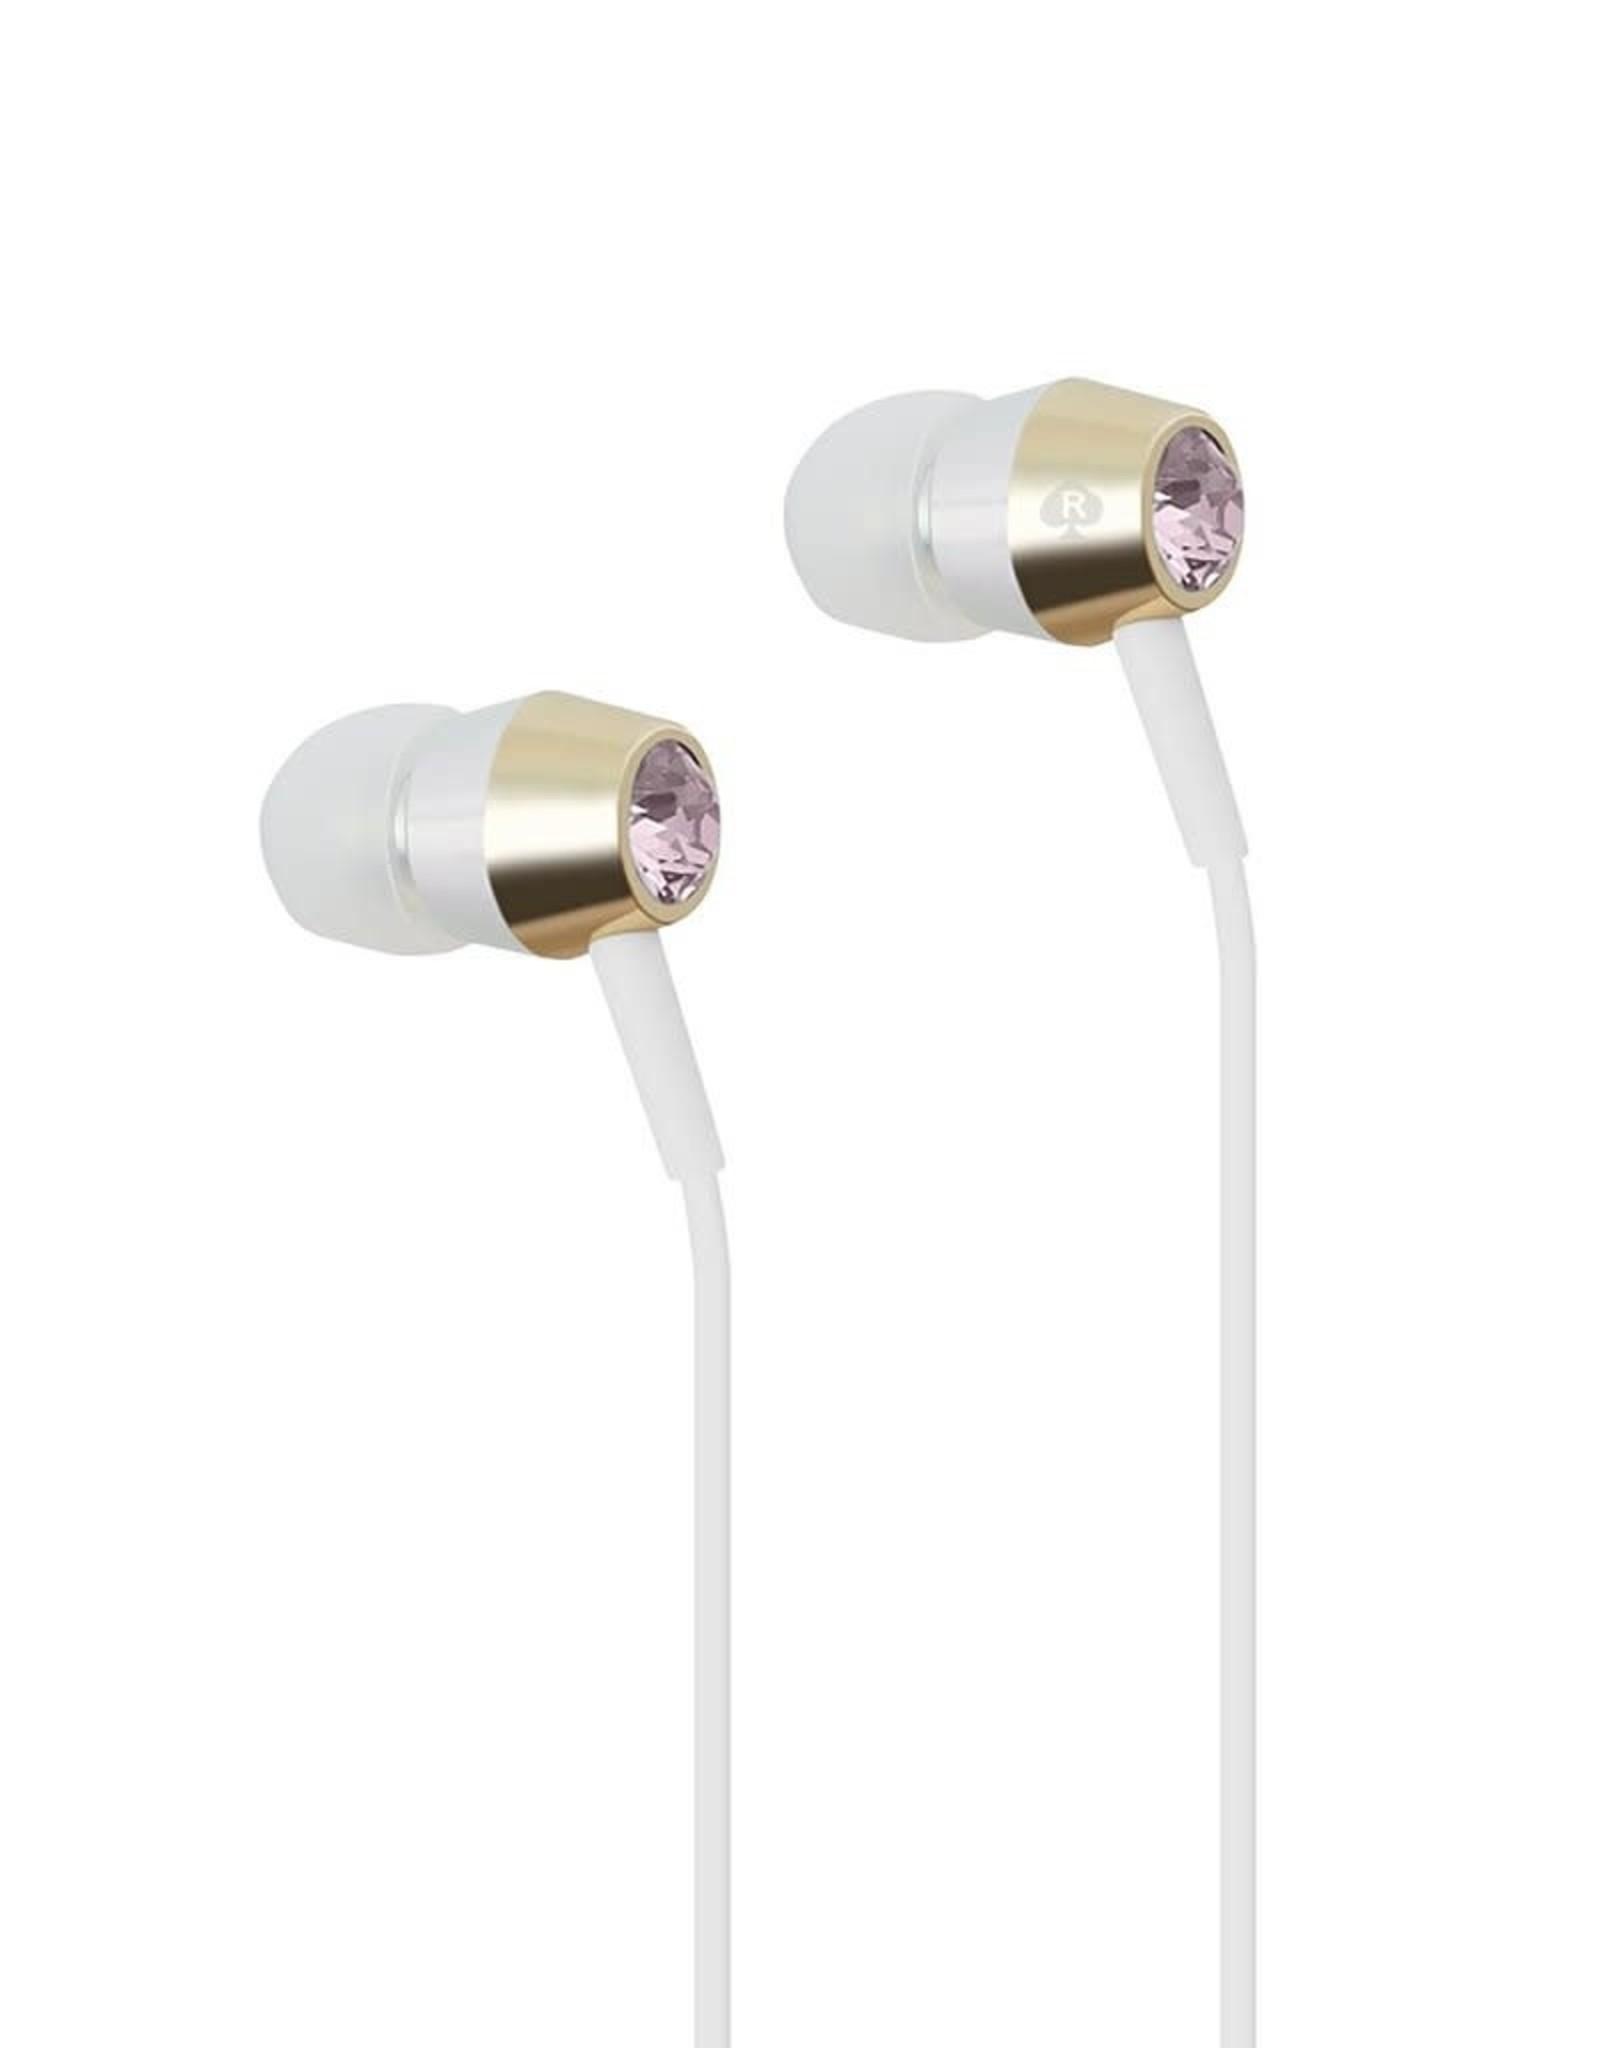 /// Kate Spade New York | Earbuds Crystal Rose Gold | KSNYEB-CRGS